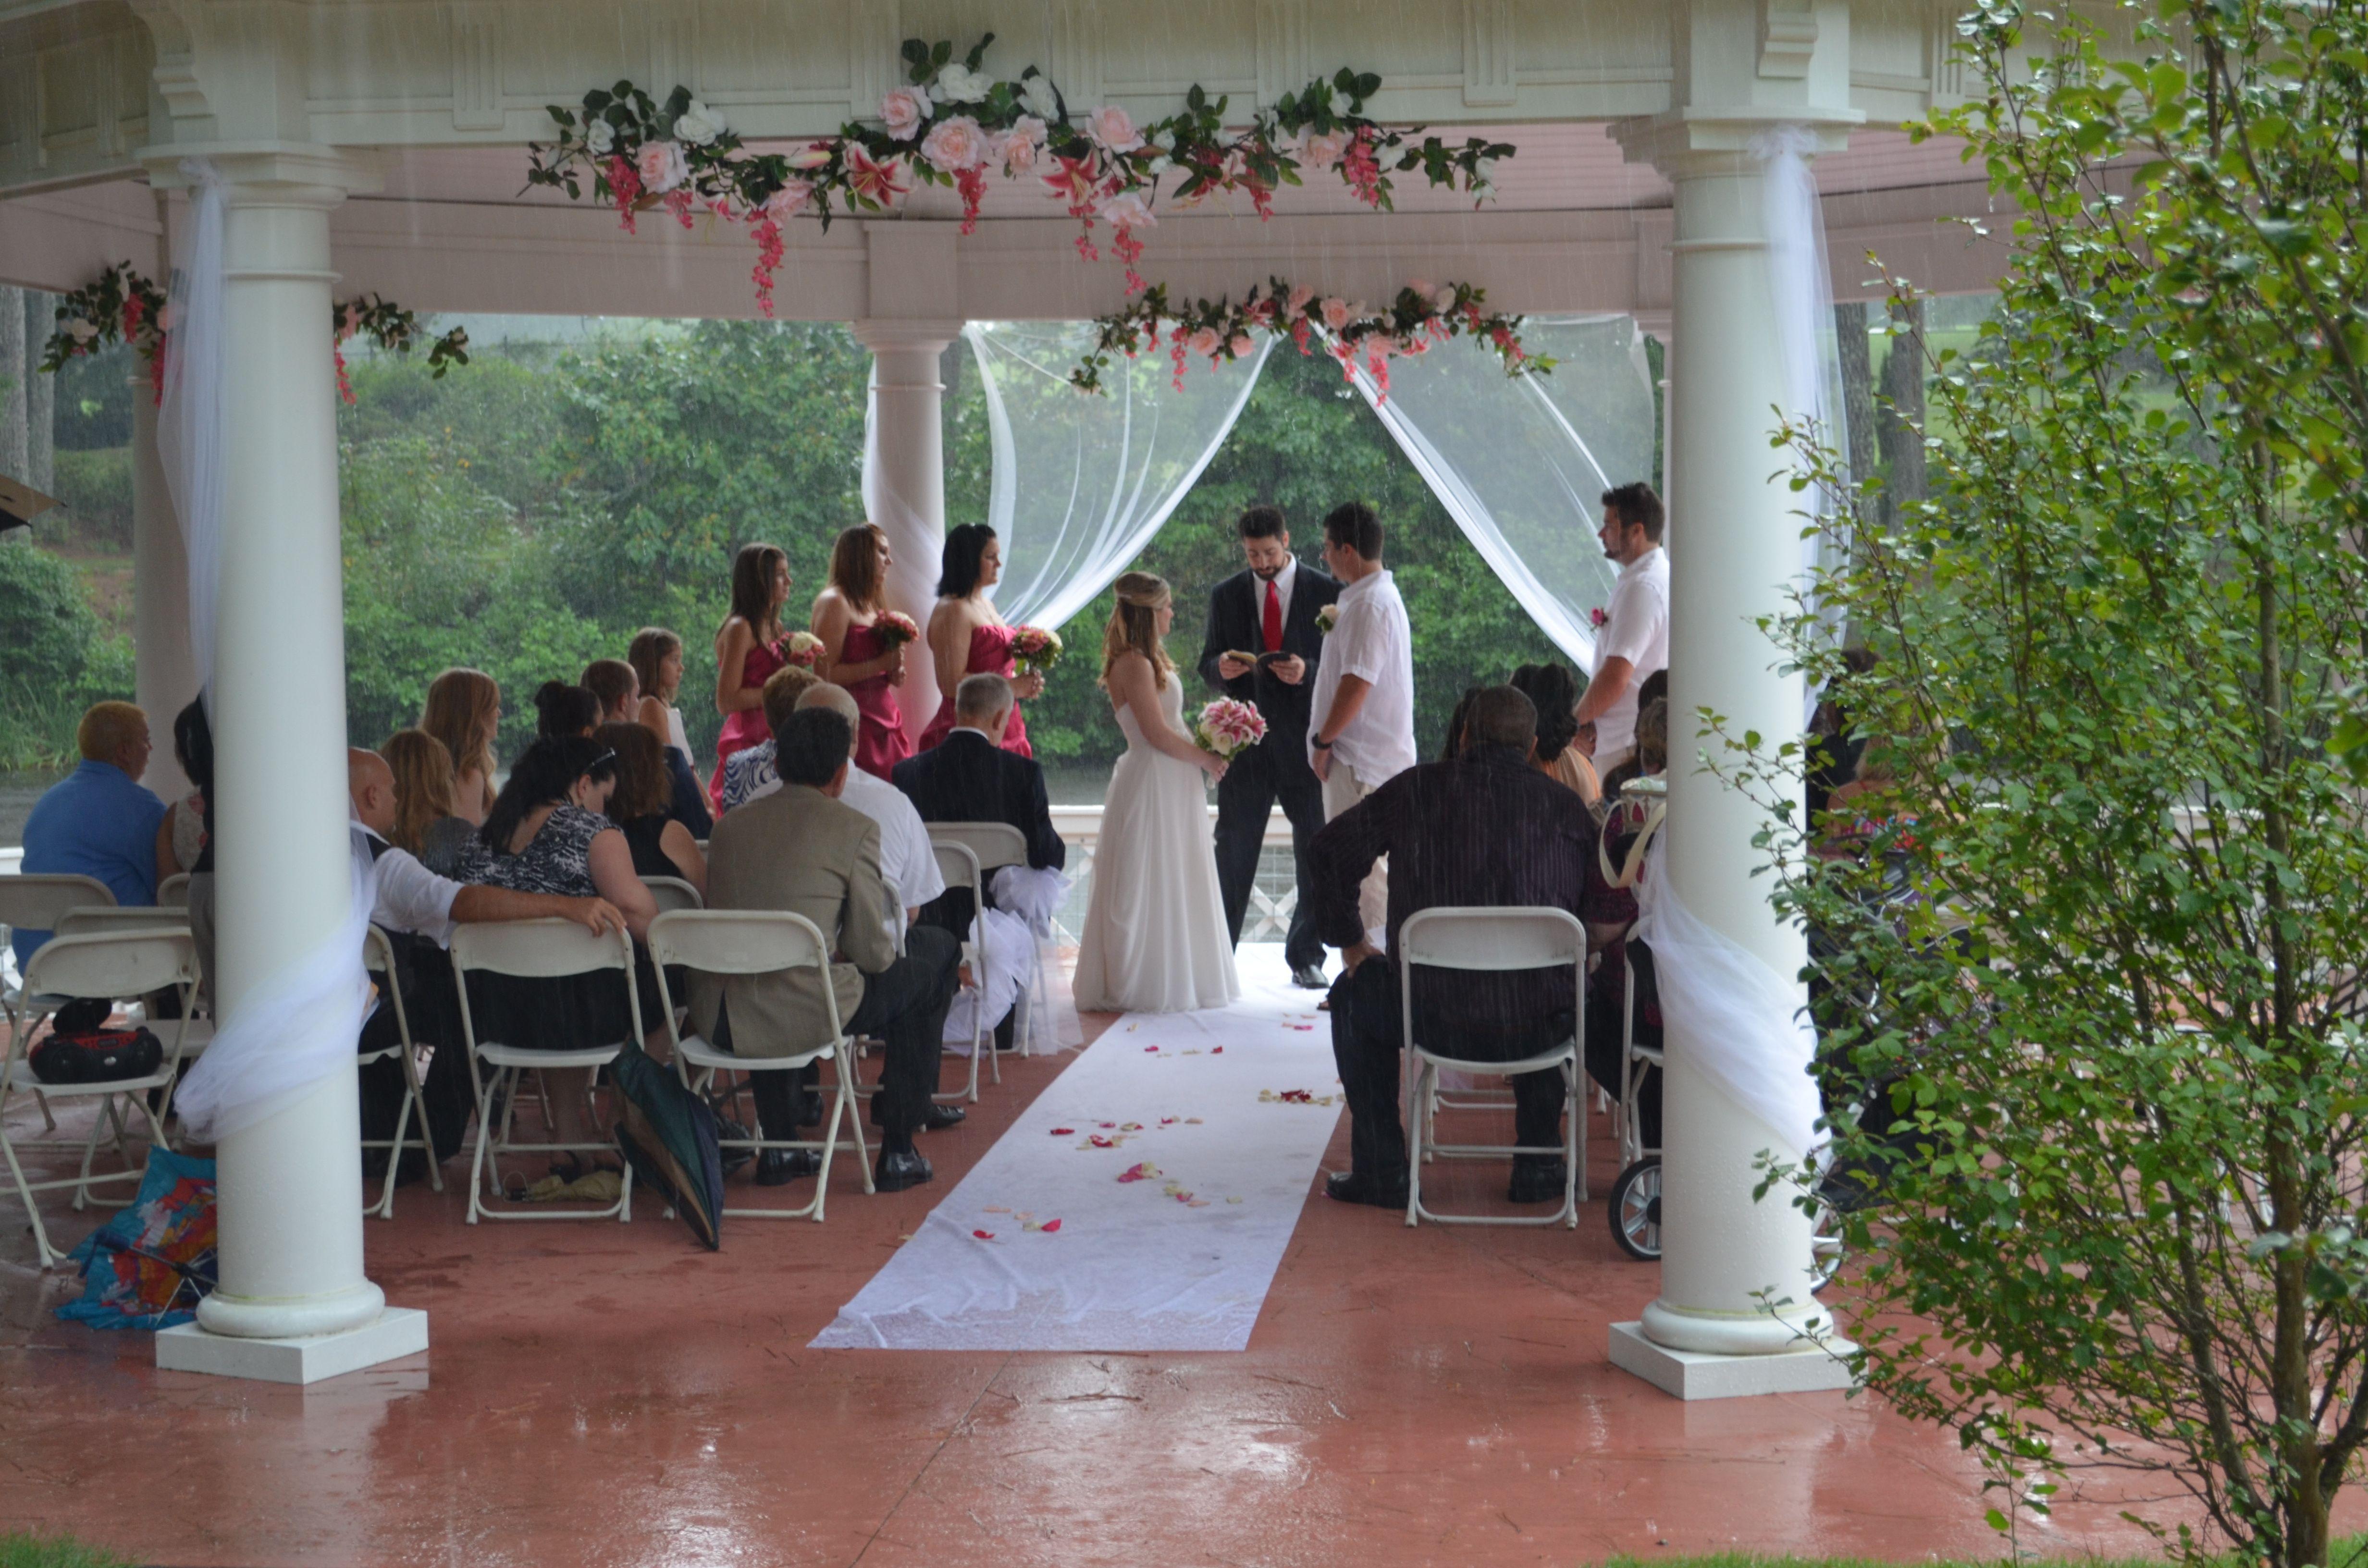 Pin by paige marie on Wedding Ideas Pavilion, Wedding, Lake